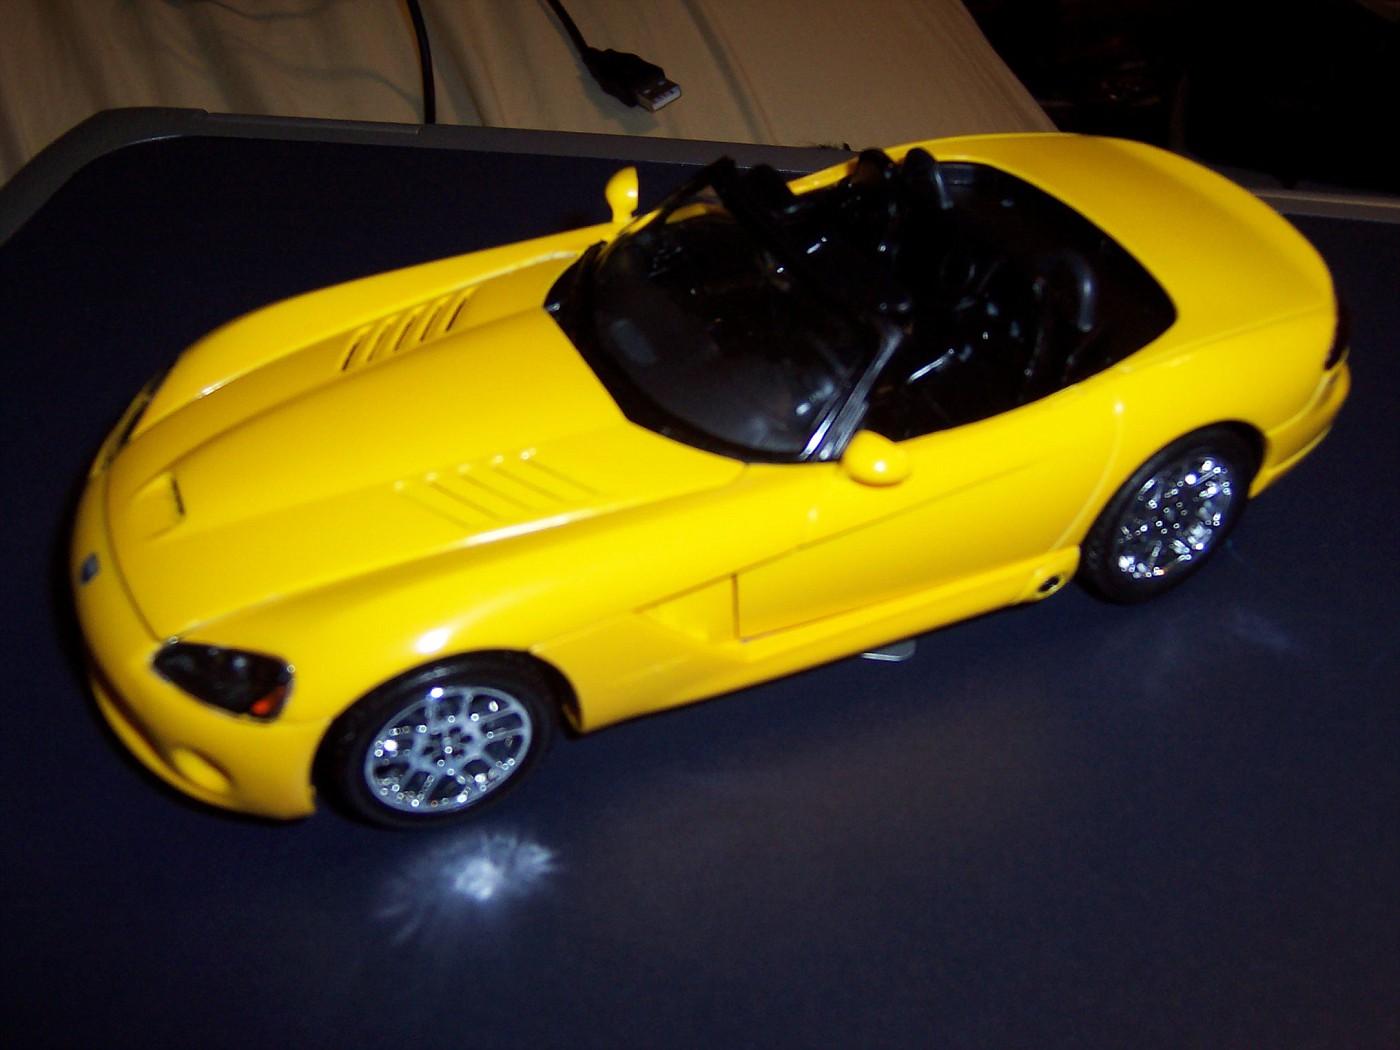 ViperSRT10001-vi.jpg